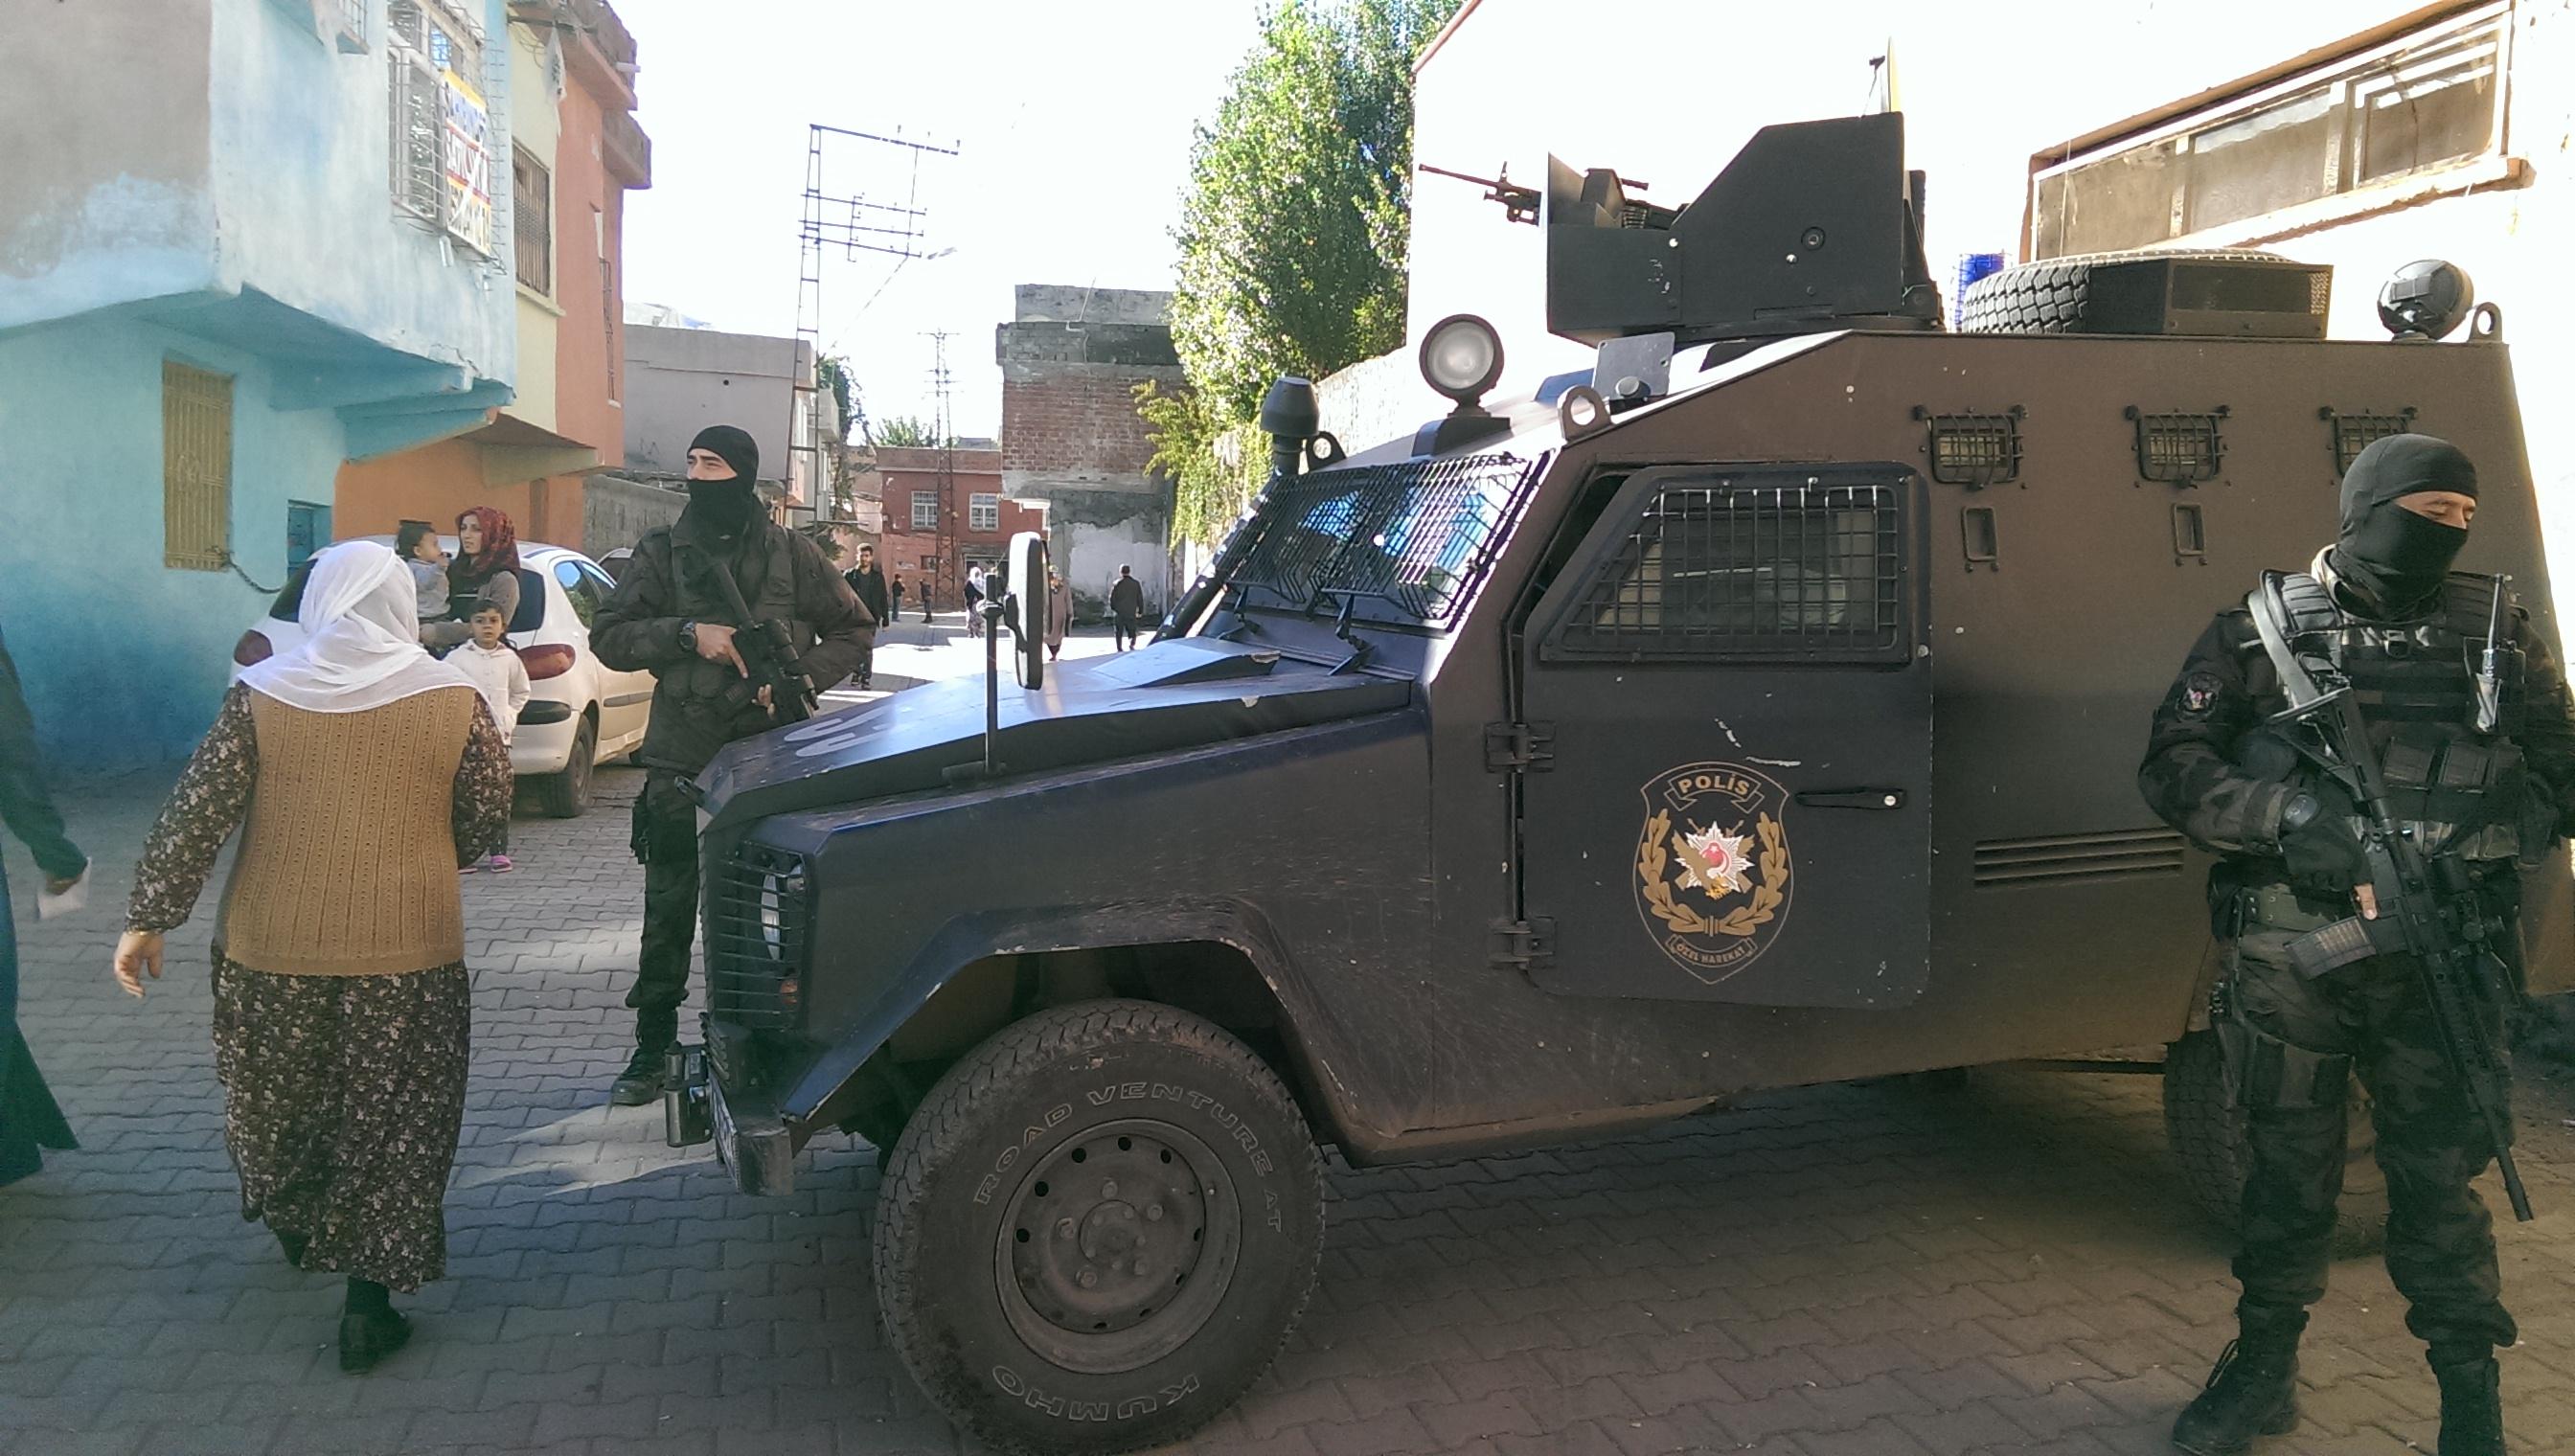 Valg Diyarbakir nov. 2015